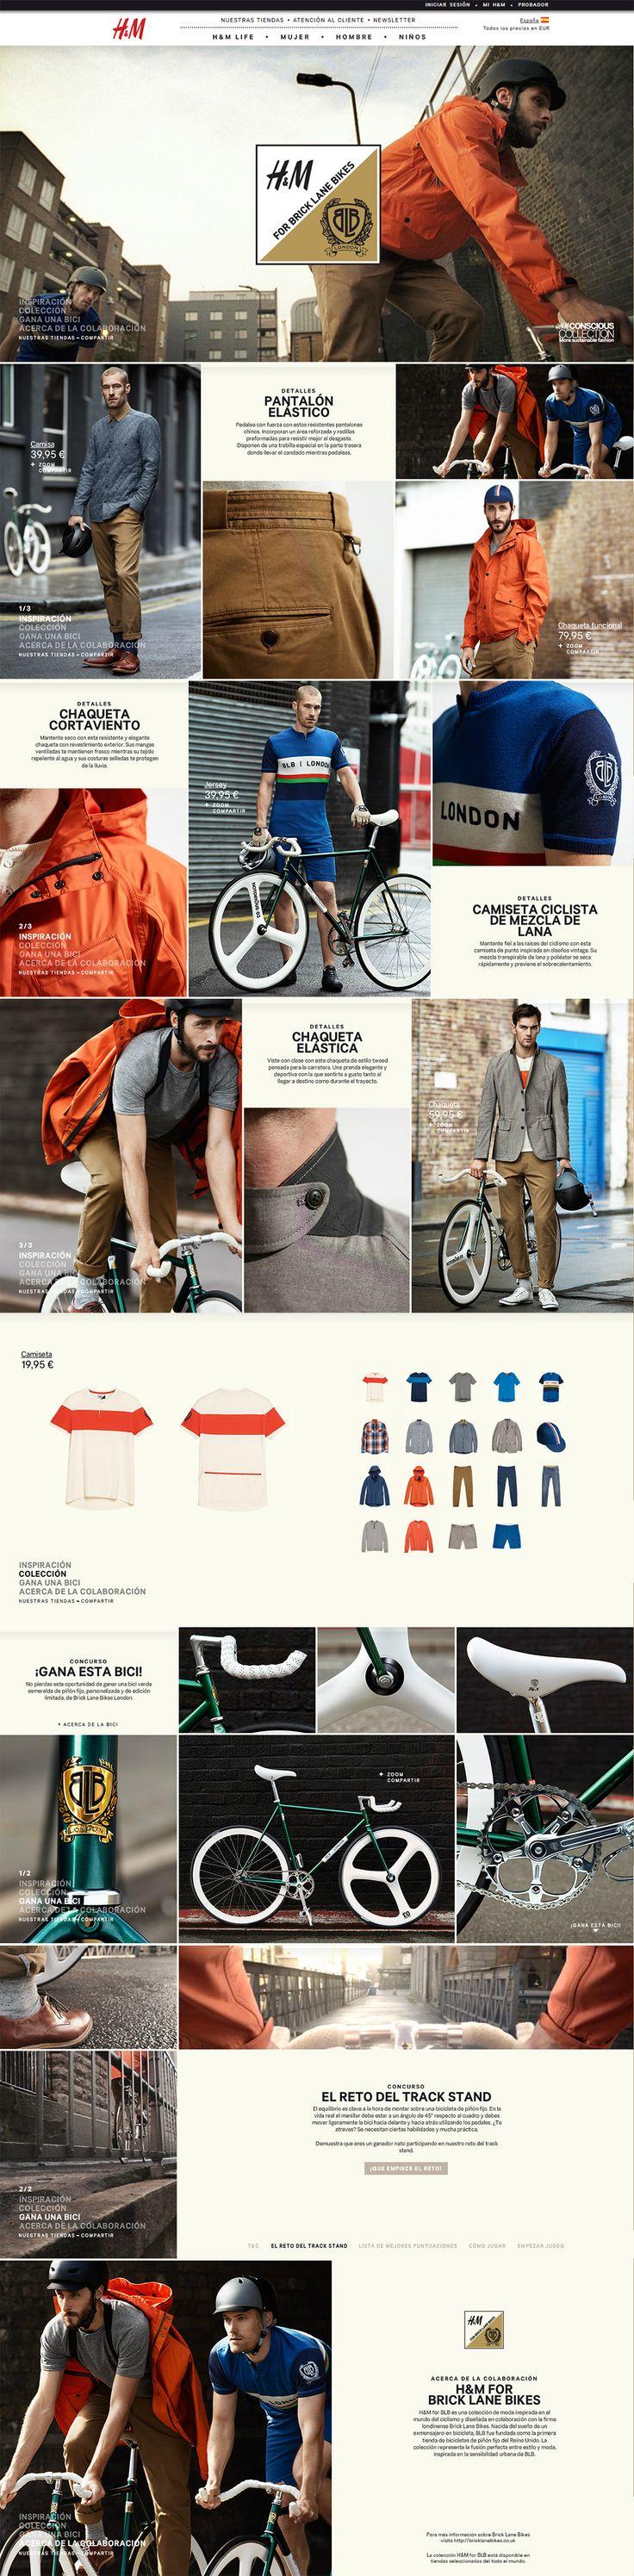 Web Graphic design. UI layout. Fashion E_Commerce